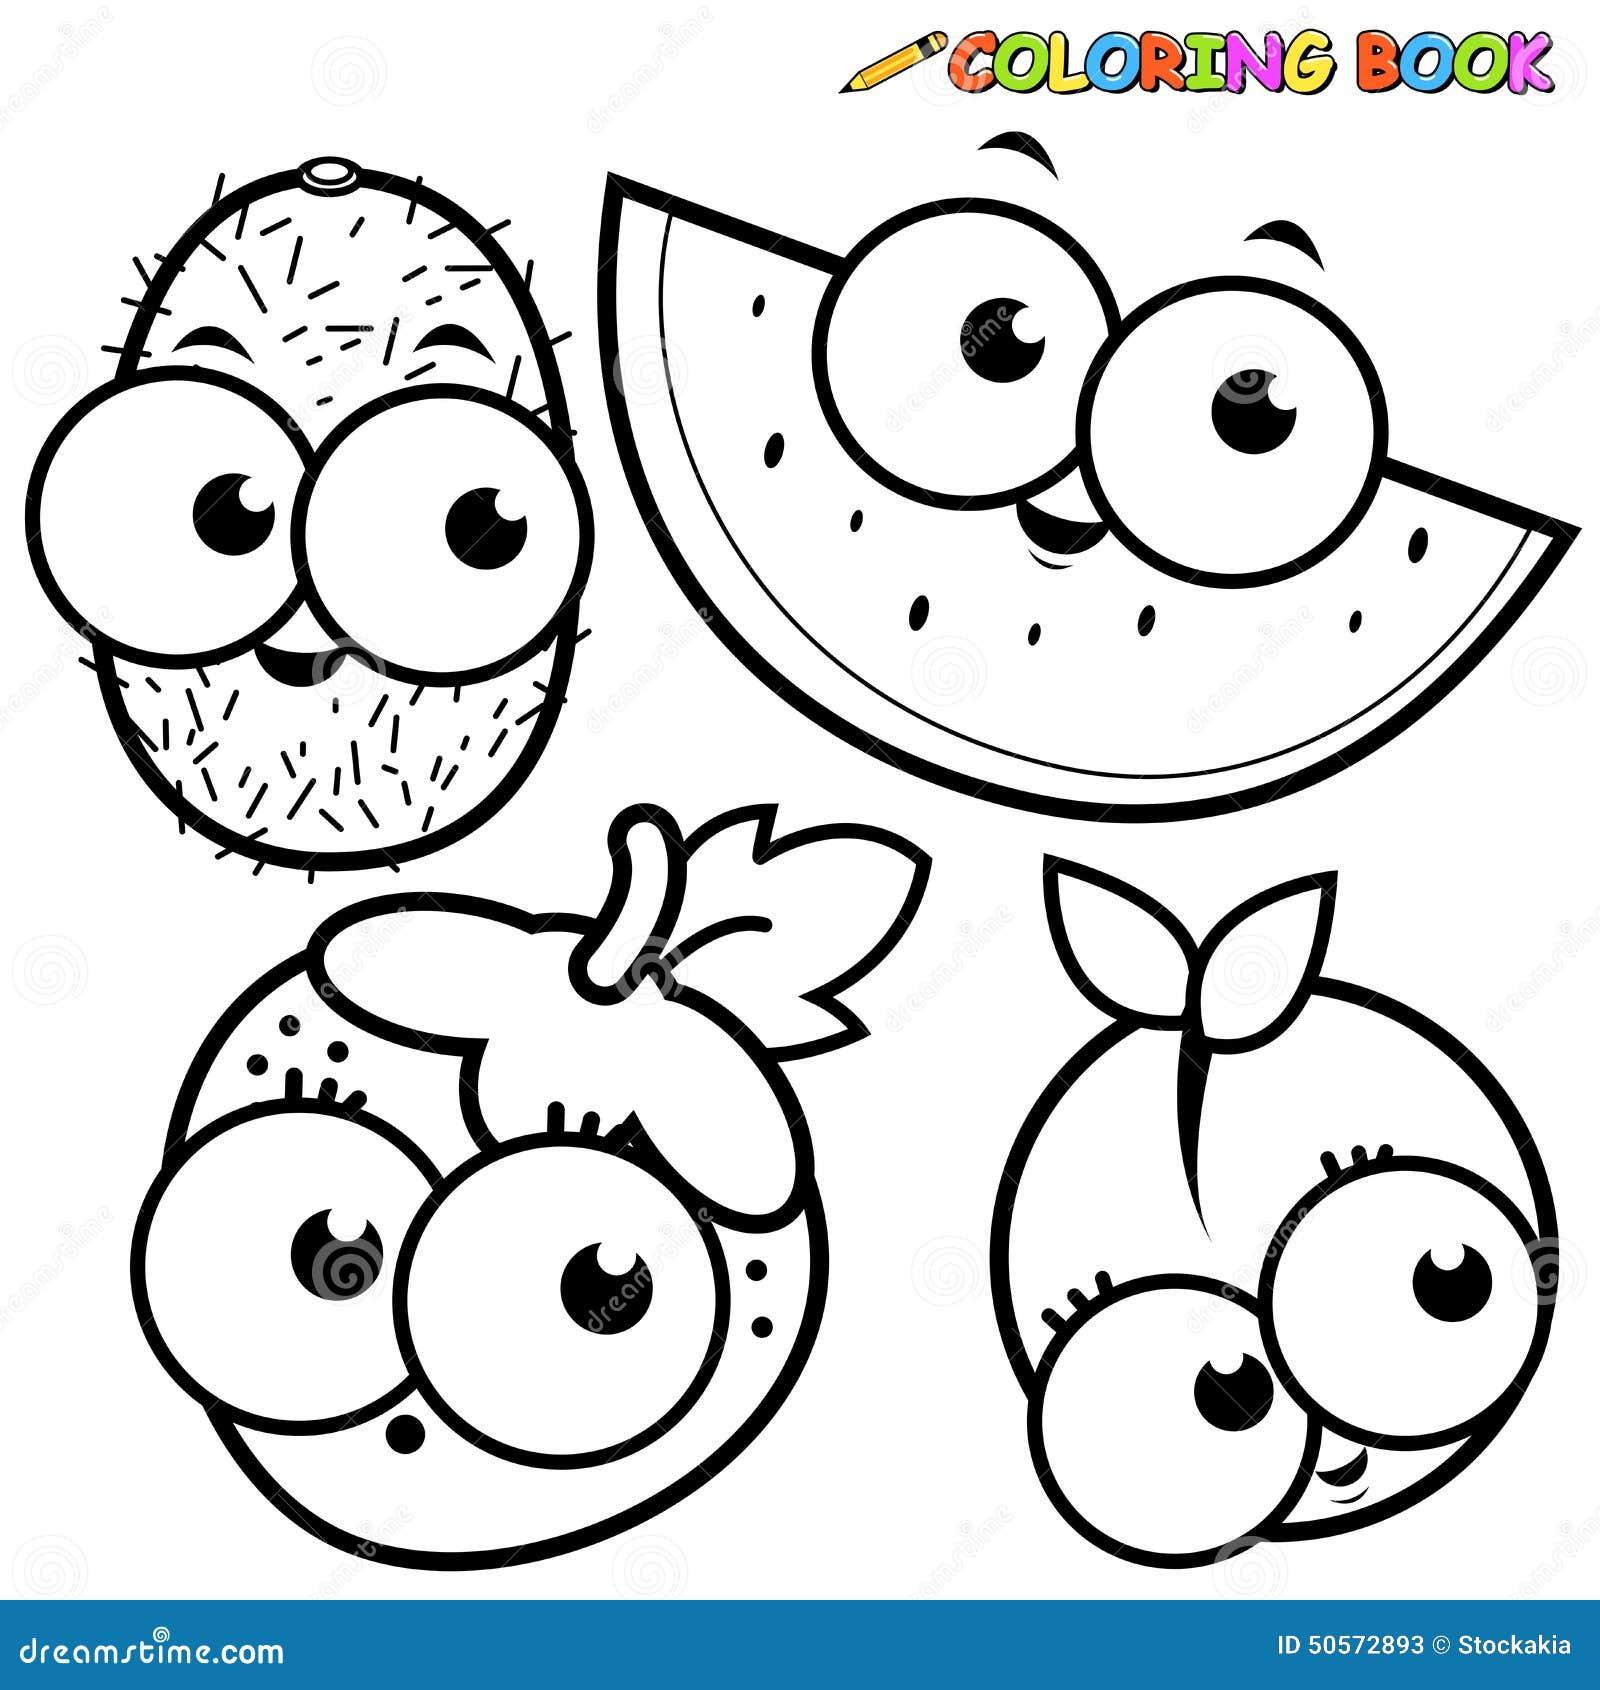 Branche De Fruit A Pain likewise Apple Coloring Pages likewise Coloriage Oignon also Licorne Tout Petit also Coloriagepainauchocolat. on dragon fruit